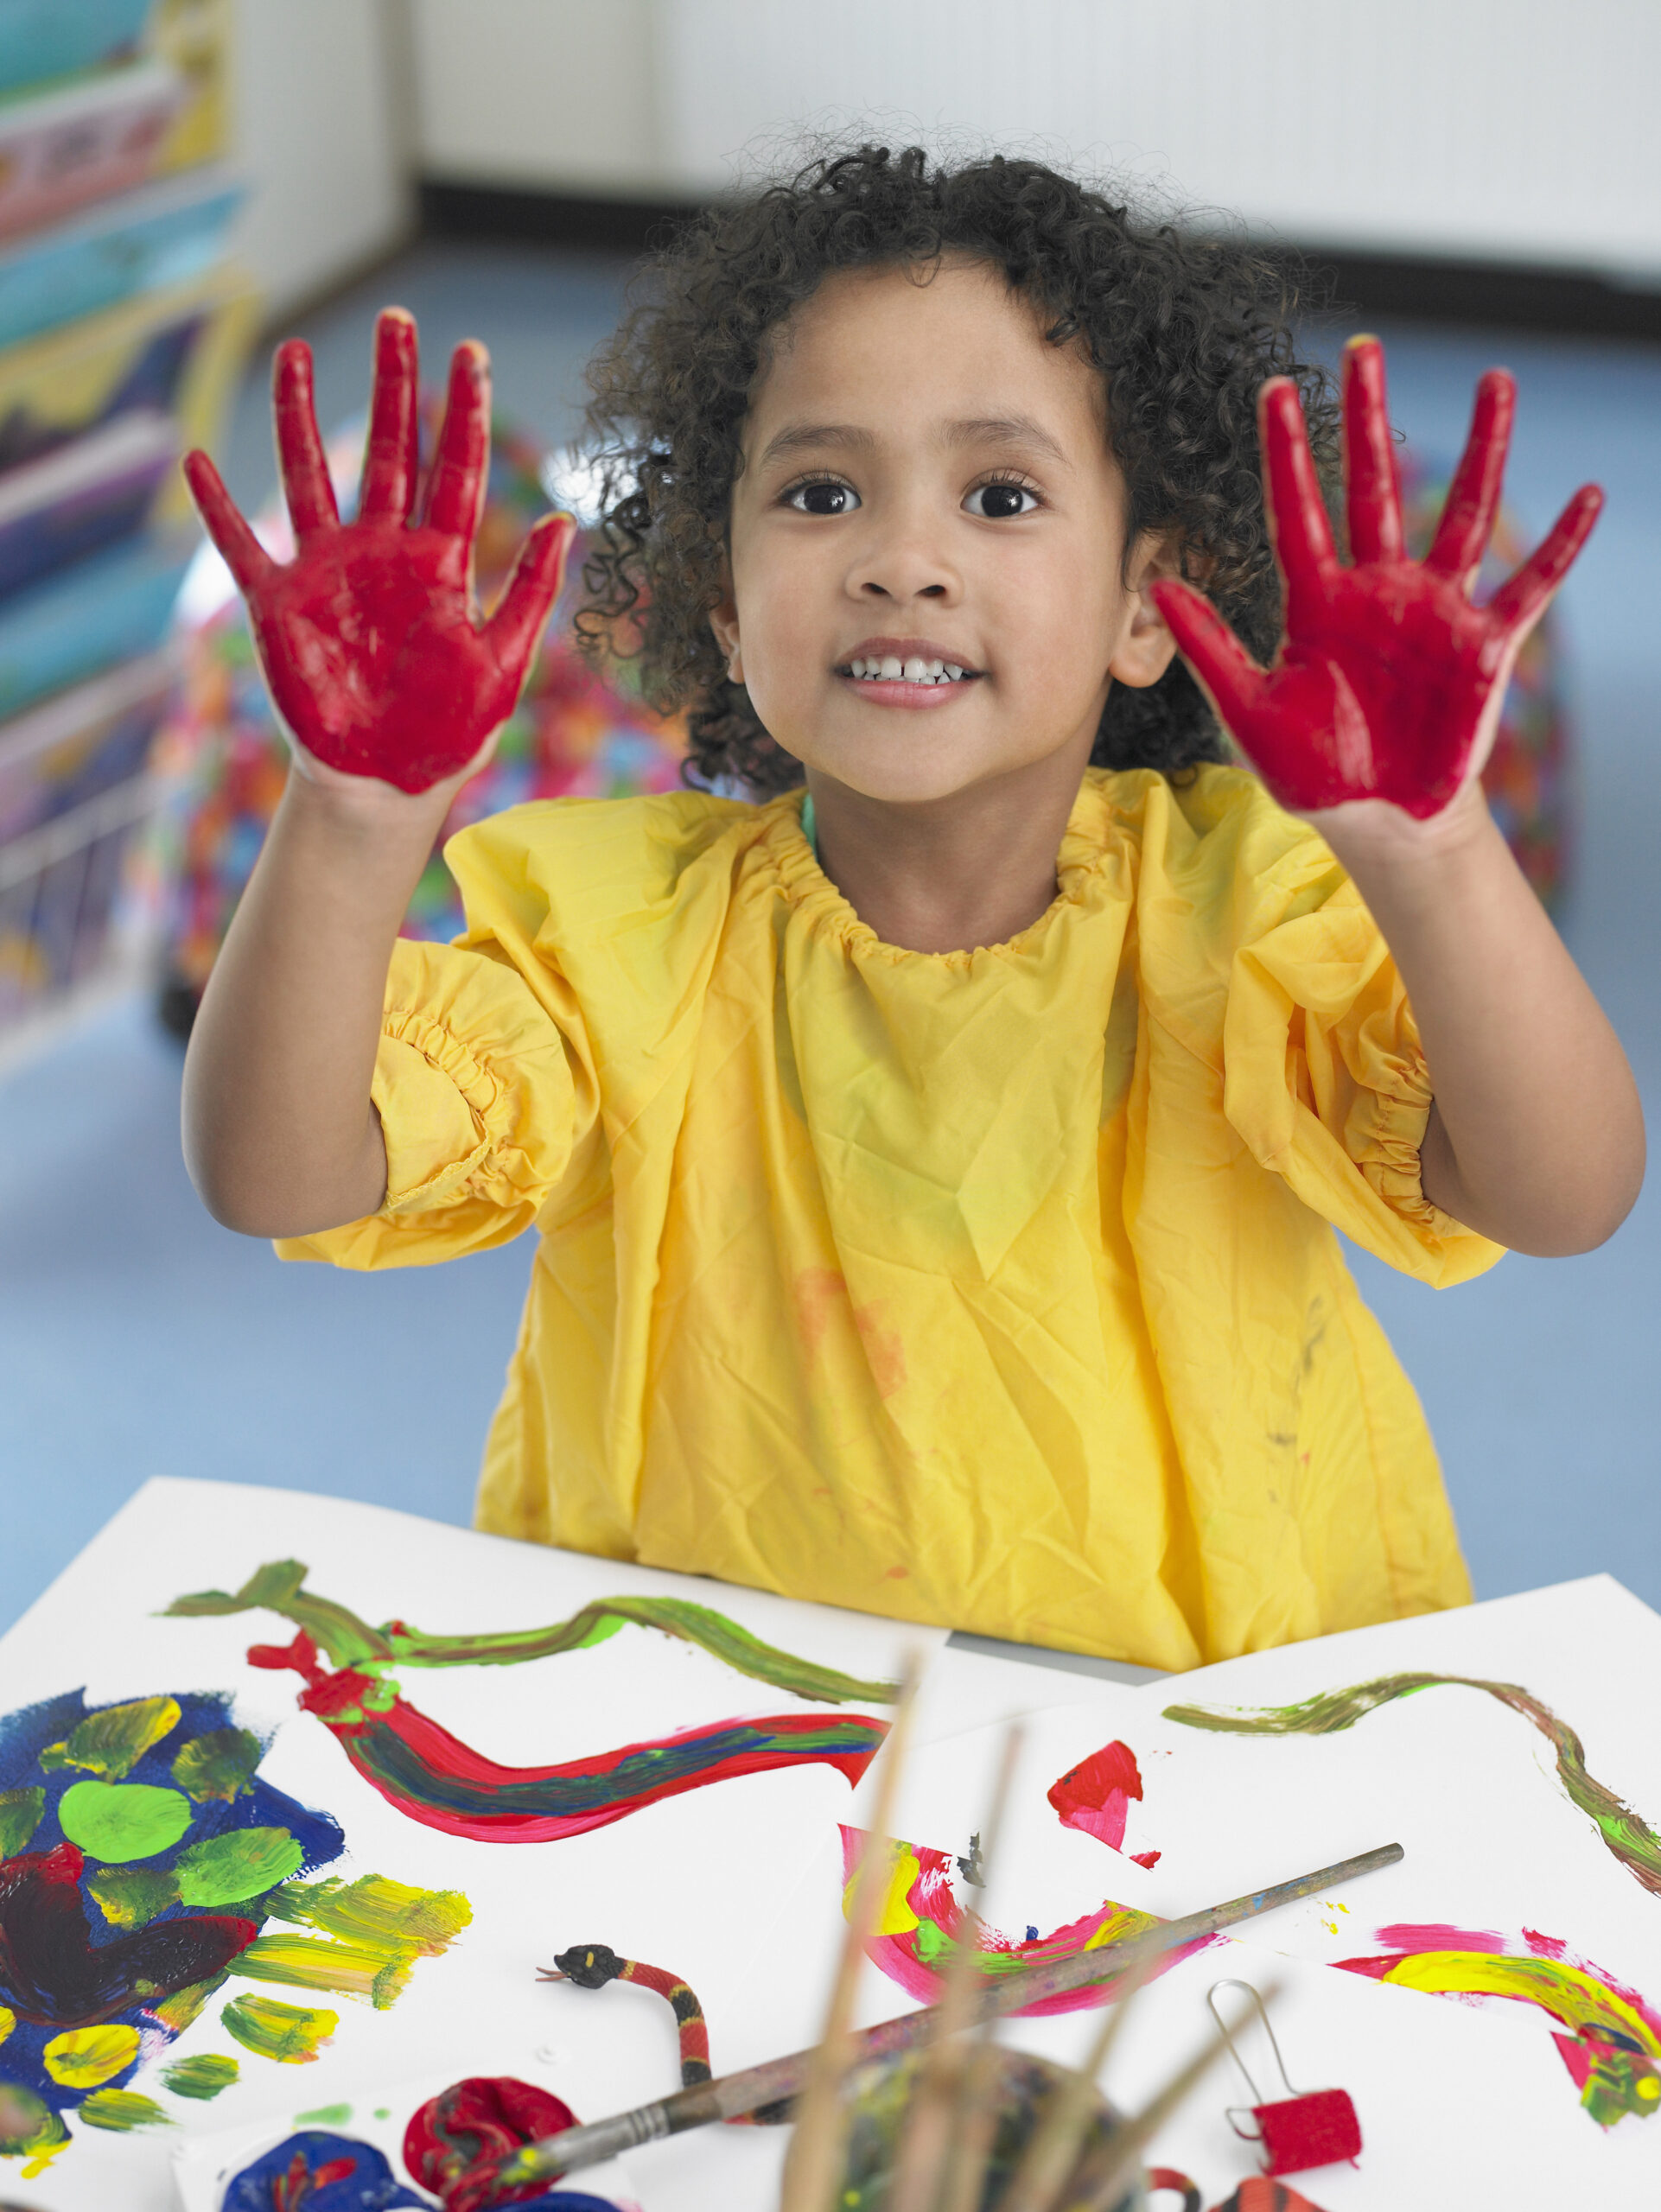 Portrait of cute little girl finger painting in art class